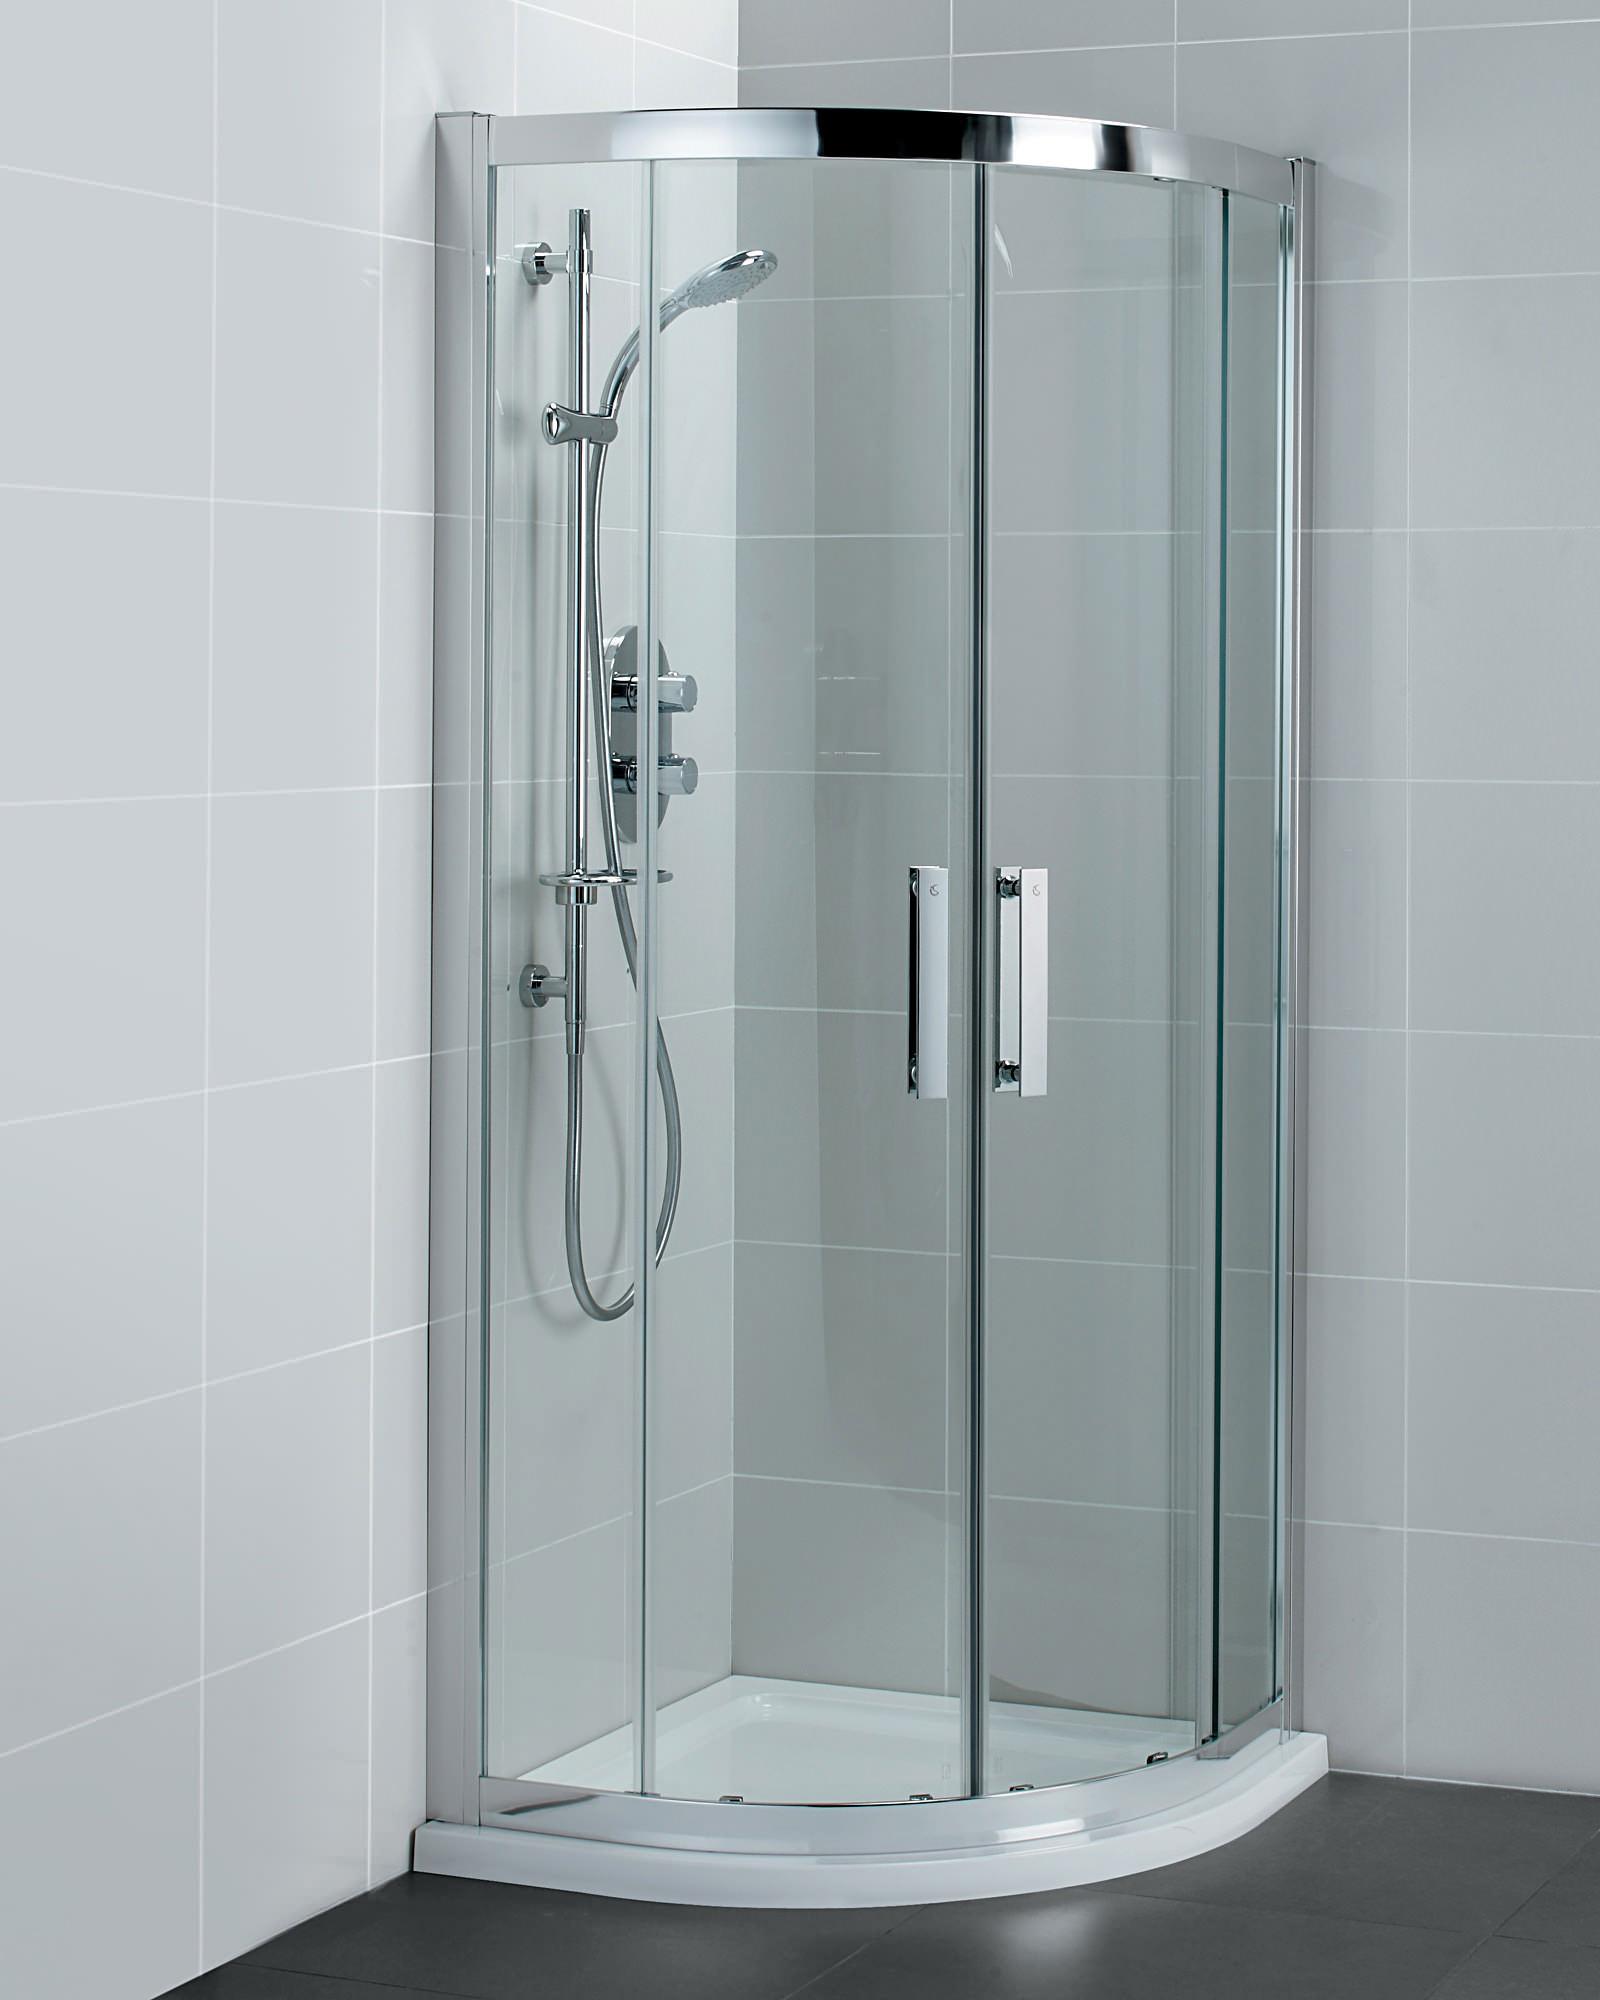 Ideal Standard Synergy Quadrant Shower Enclosure 900 x 900mm